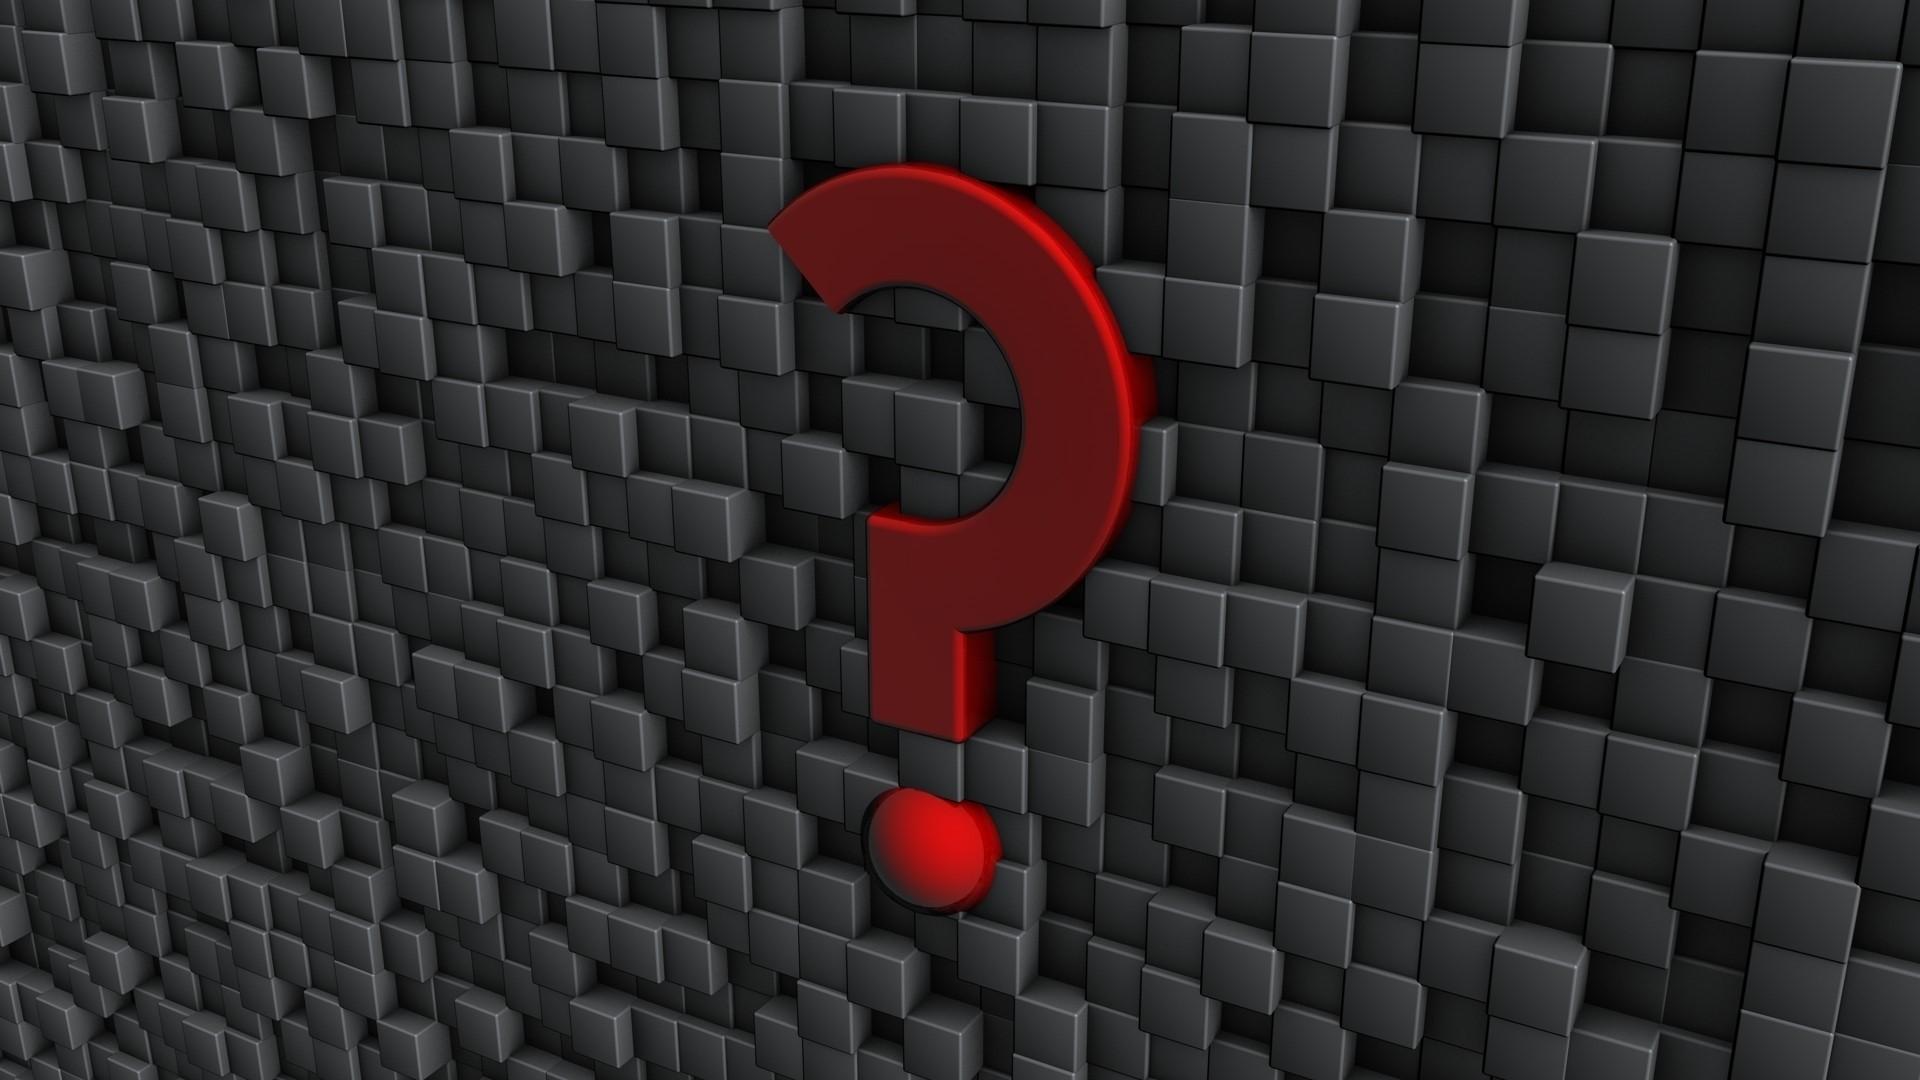 Question Mark PC Wallpaper